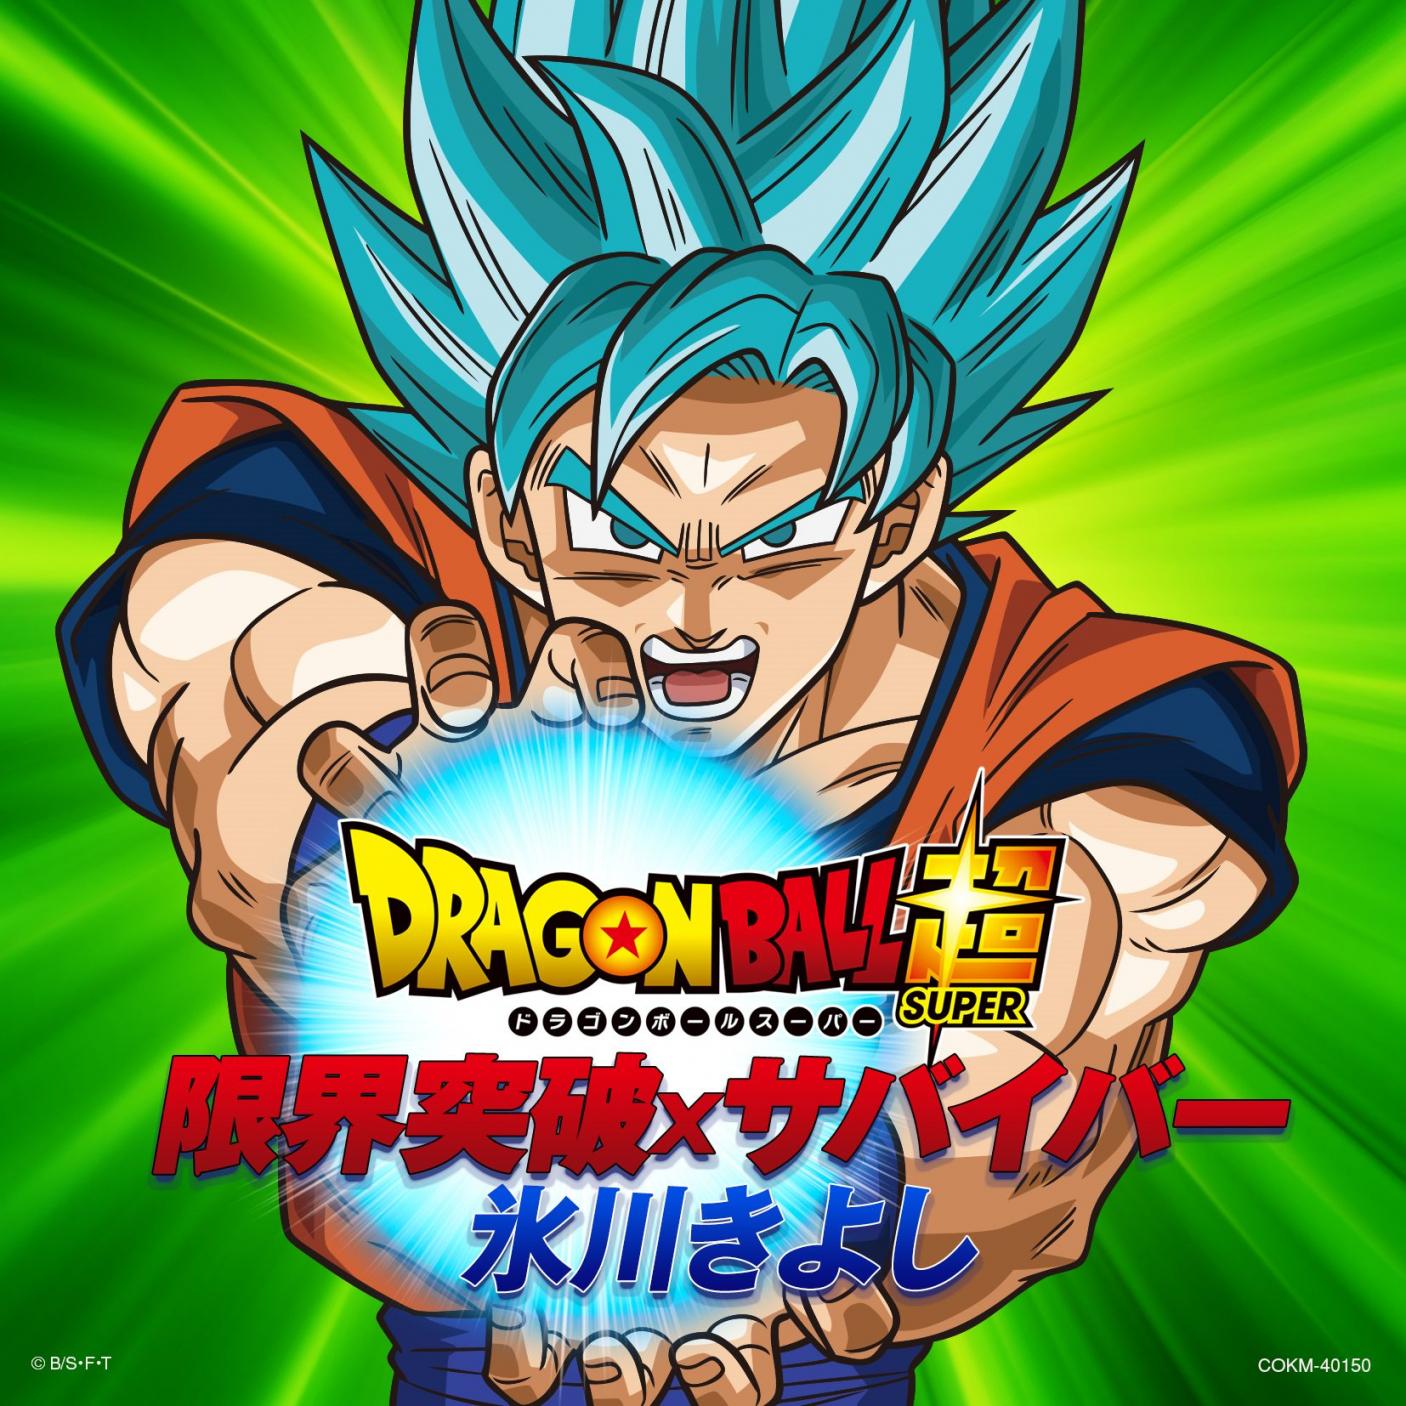 Goku Ssgss  Dragonball  Z  Gt Kai  Heroessuper  Pinterest von Dragonball Z Bettwäsche Bild